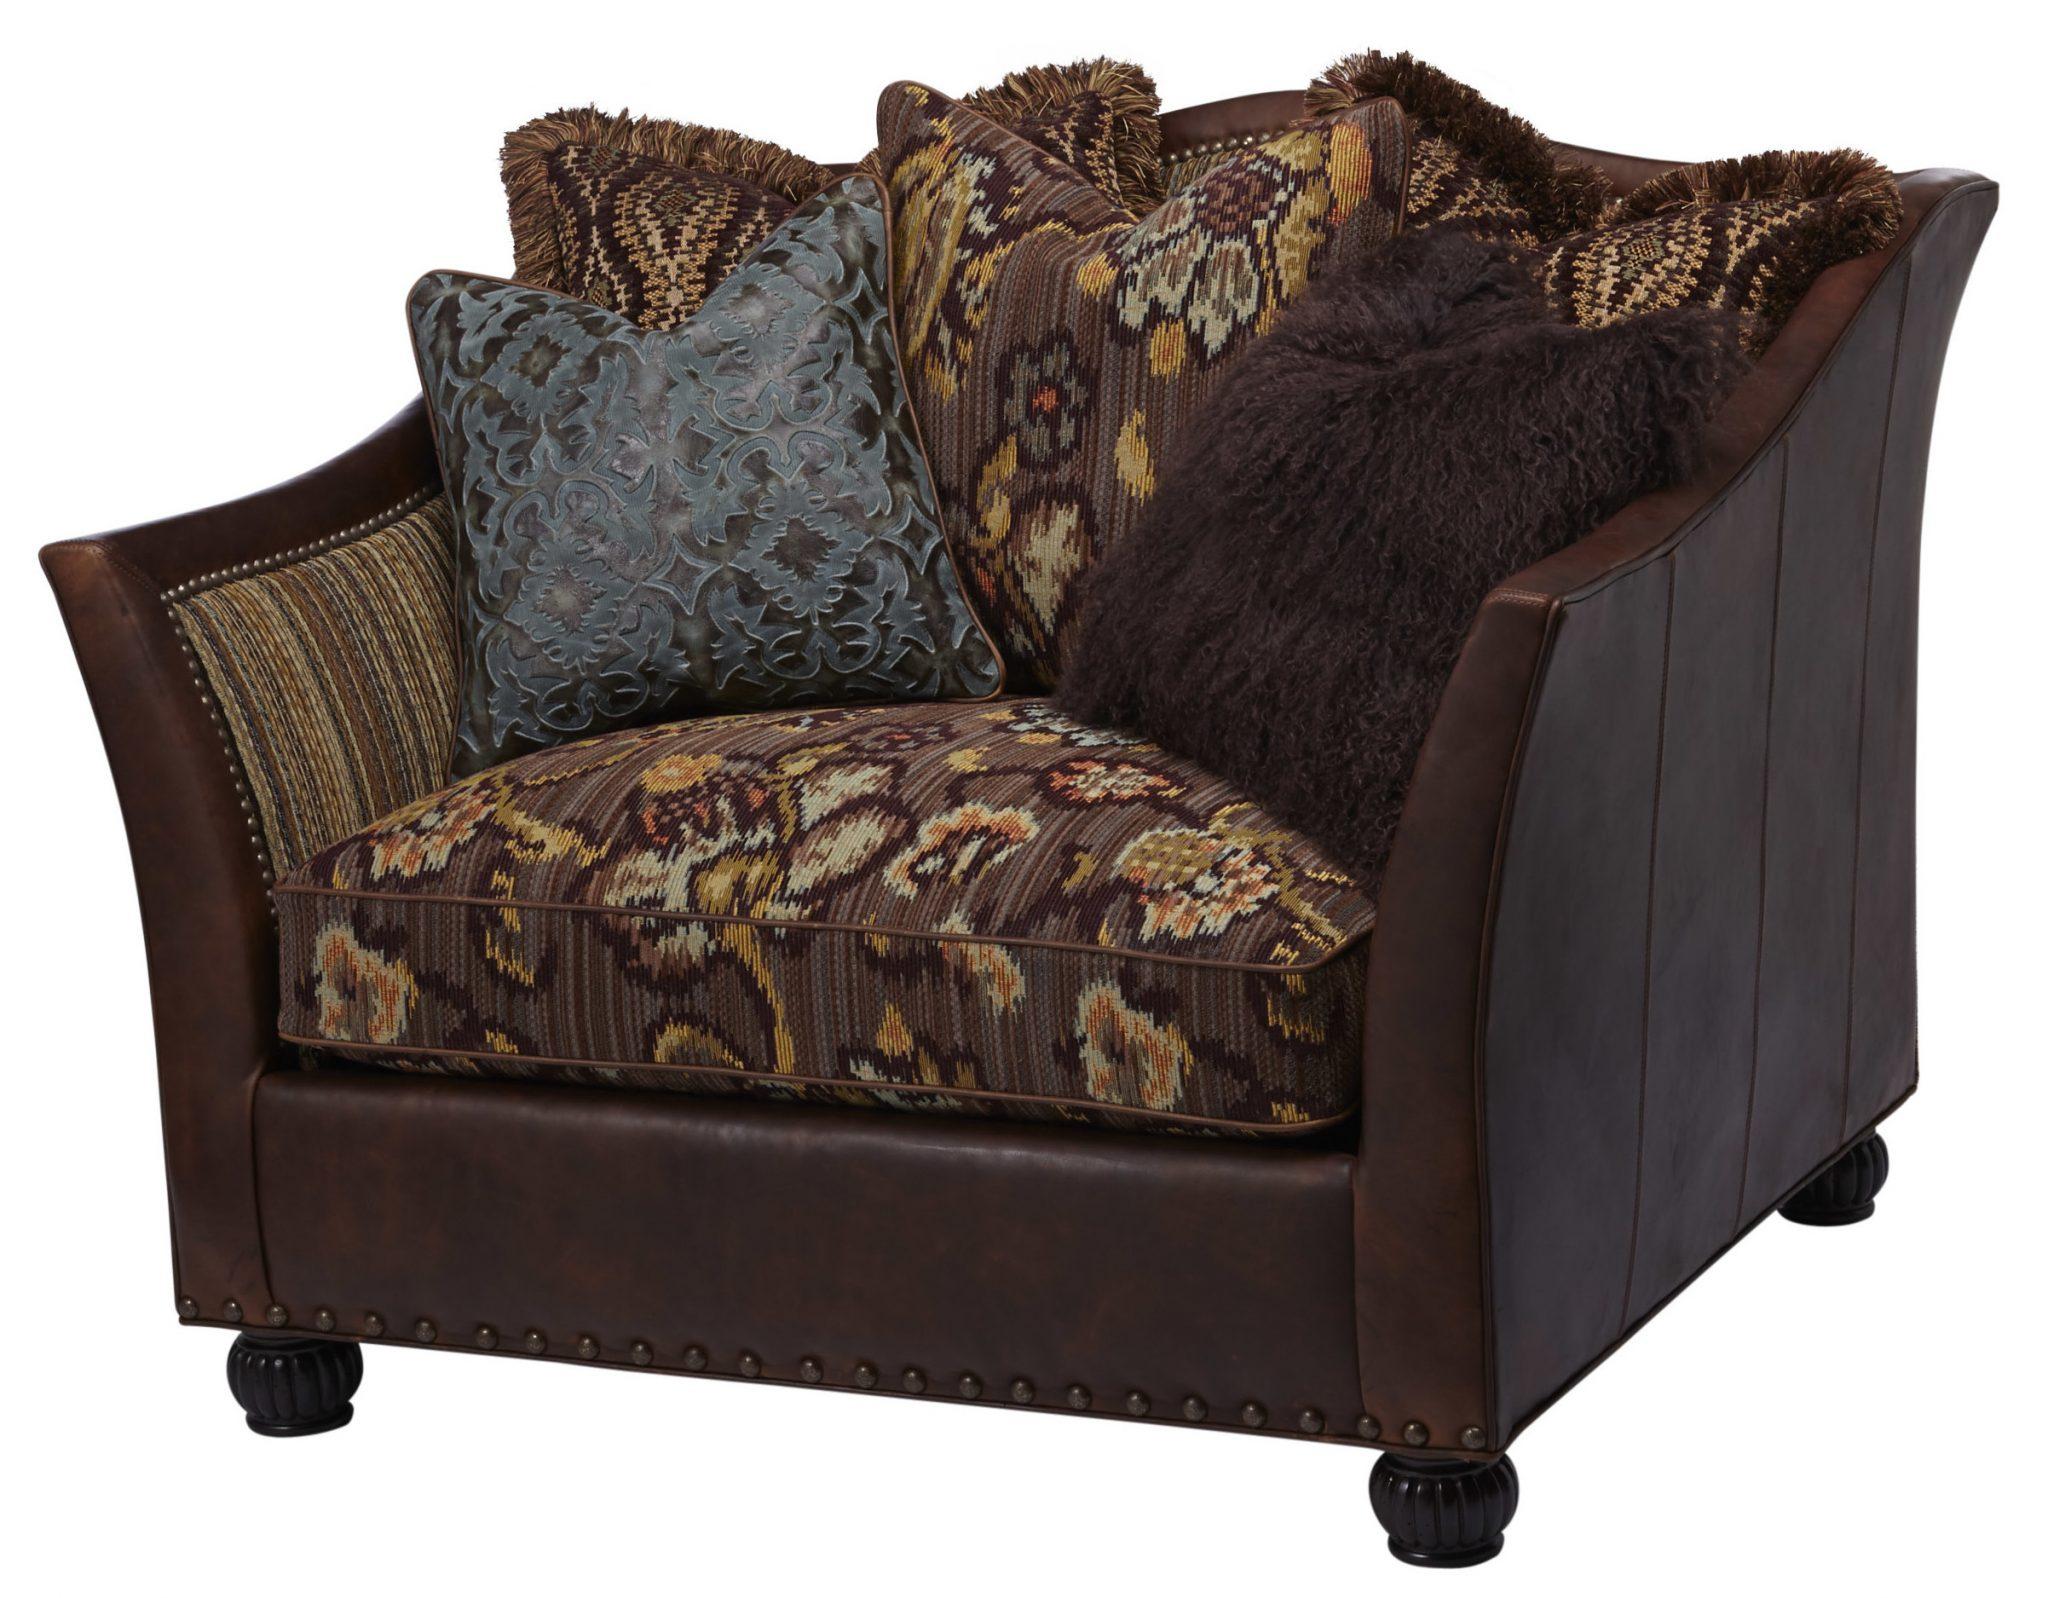 sofa net massoud furniture okaycreations cupboard reviews